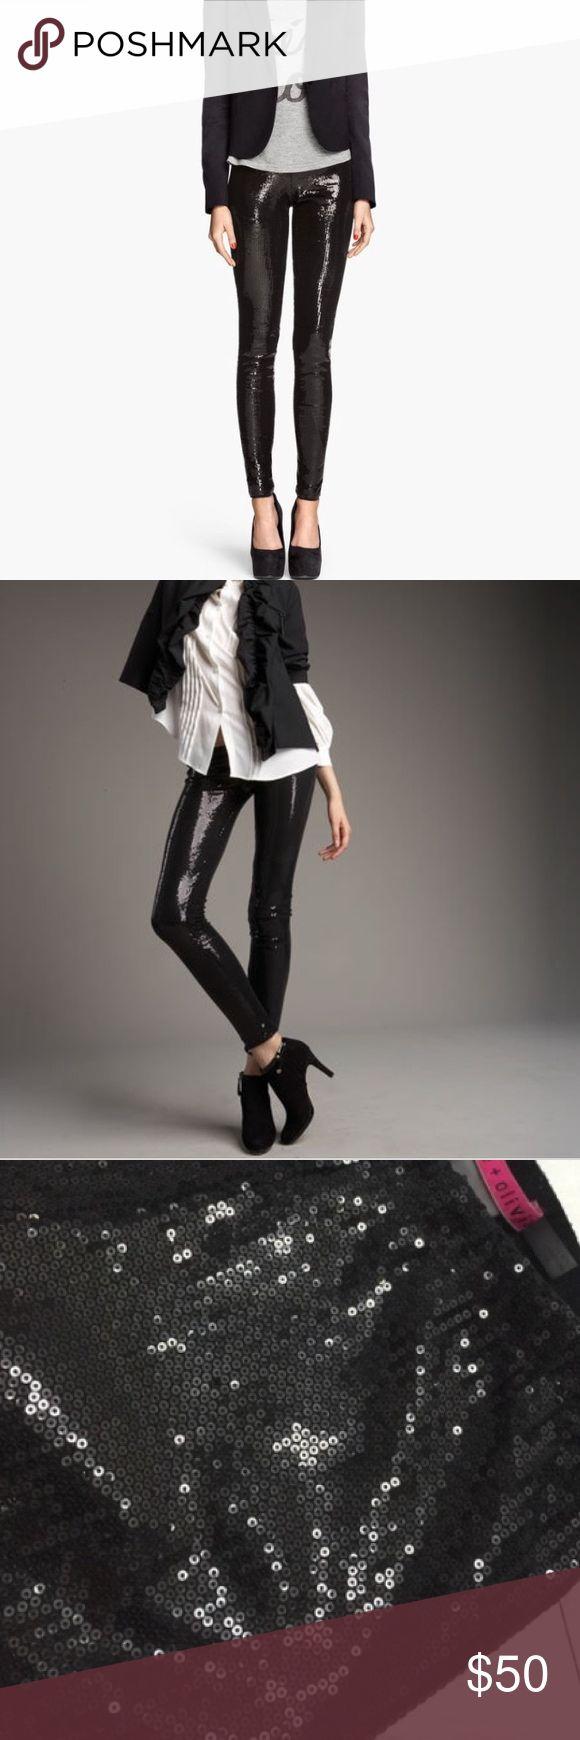 Alice + Olivia Black Sequins Leggings Authentic Alice + Olivia.  Gorgeous high quality black sequin leggings. Gathered elastic waist. Good condition.  Color: black  Size: small Alice + Olivia Pants Leggings